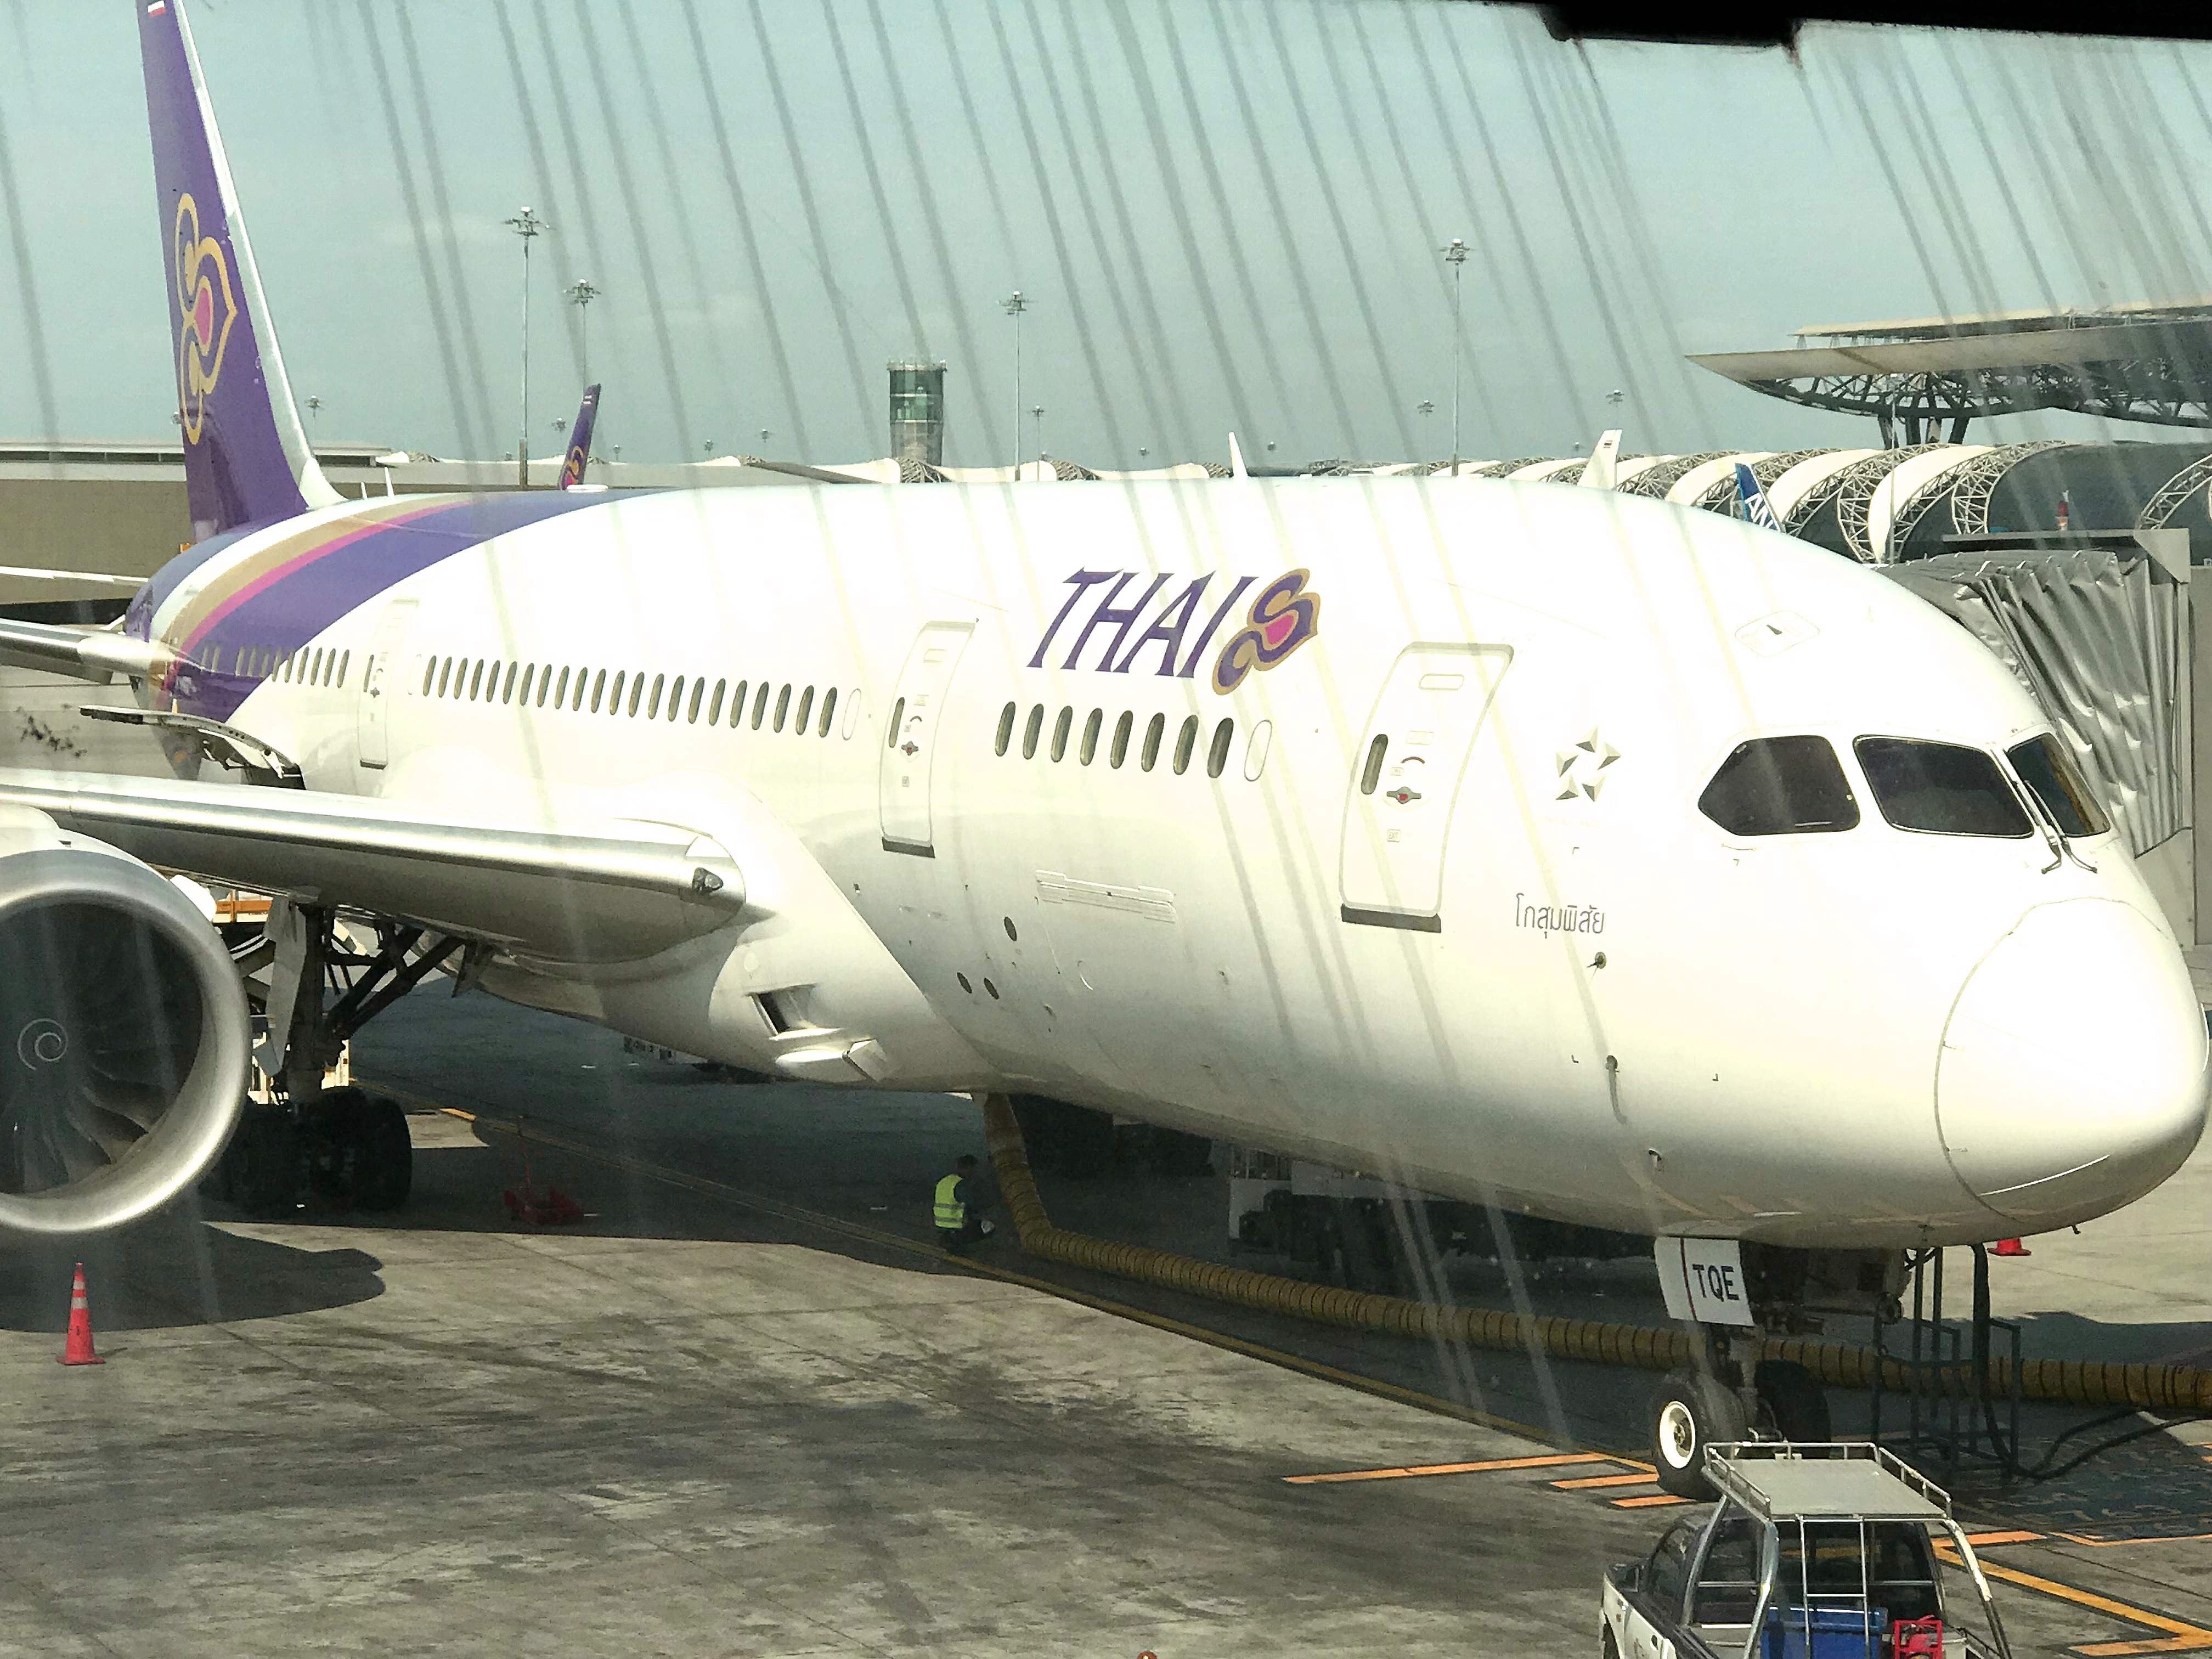 ANAマイルで国際線特典航空券を予約するコツと5人分を予約する裏技